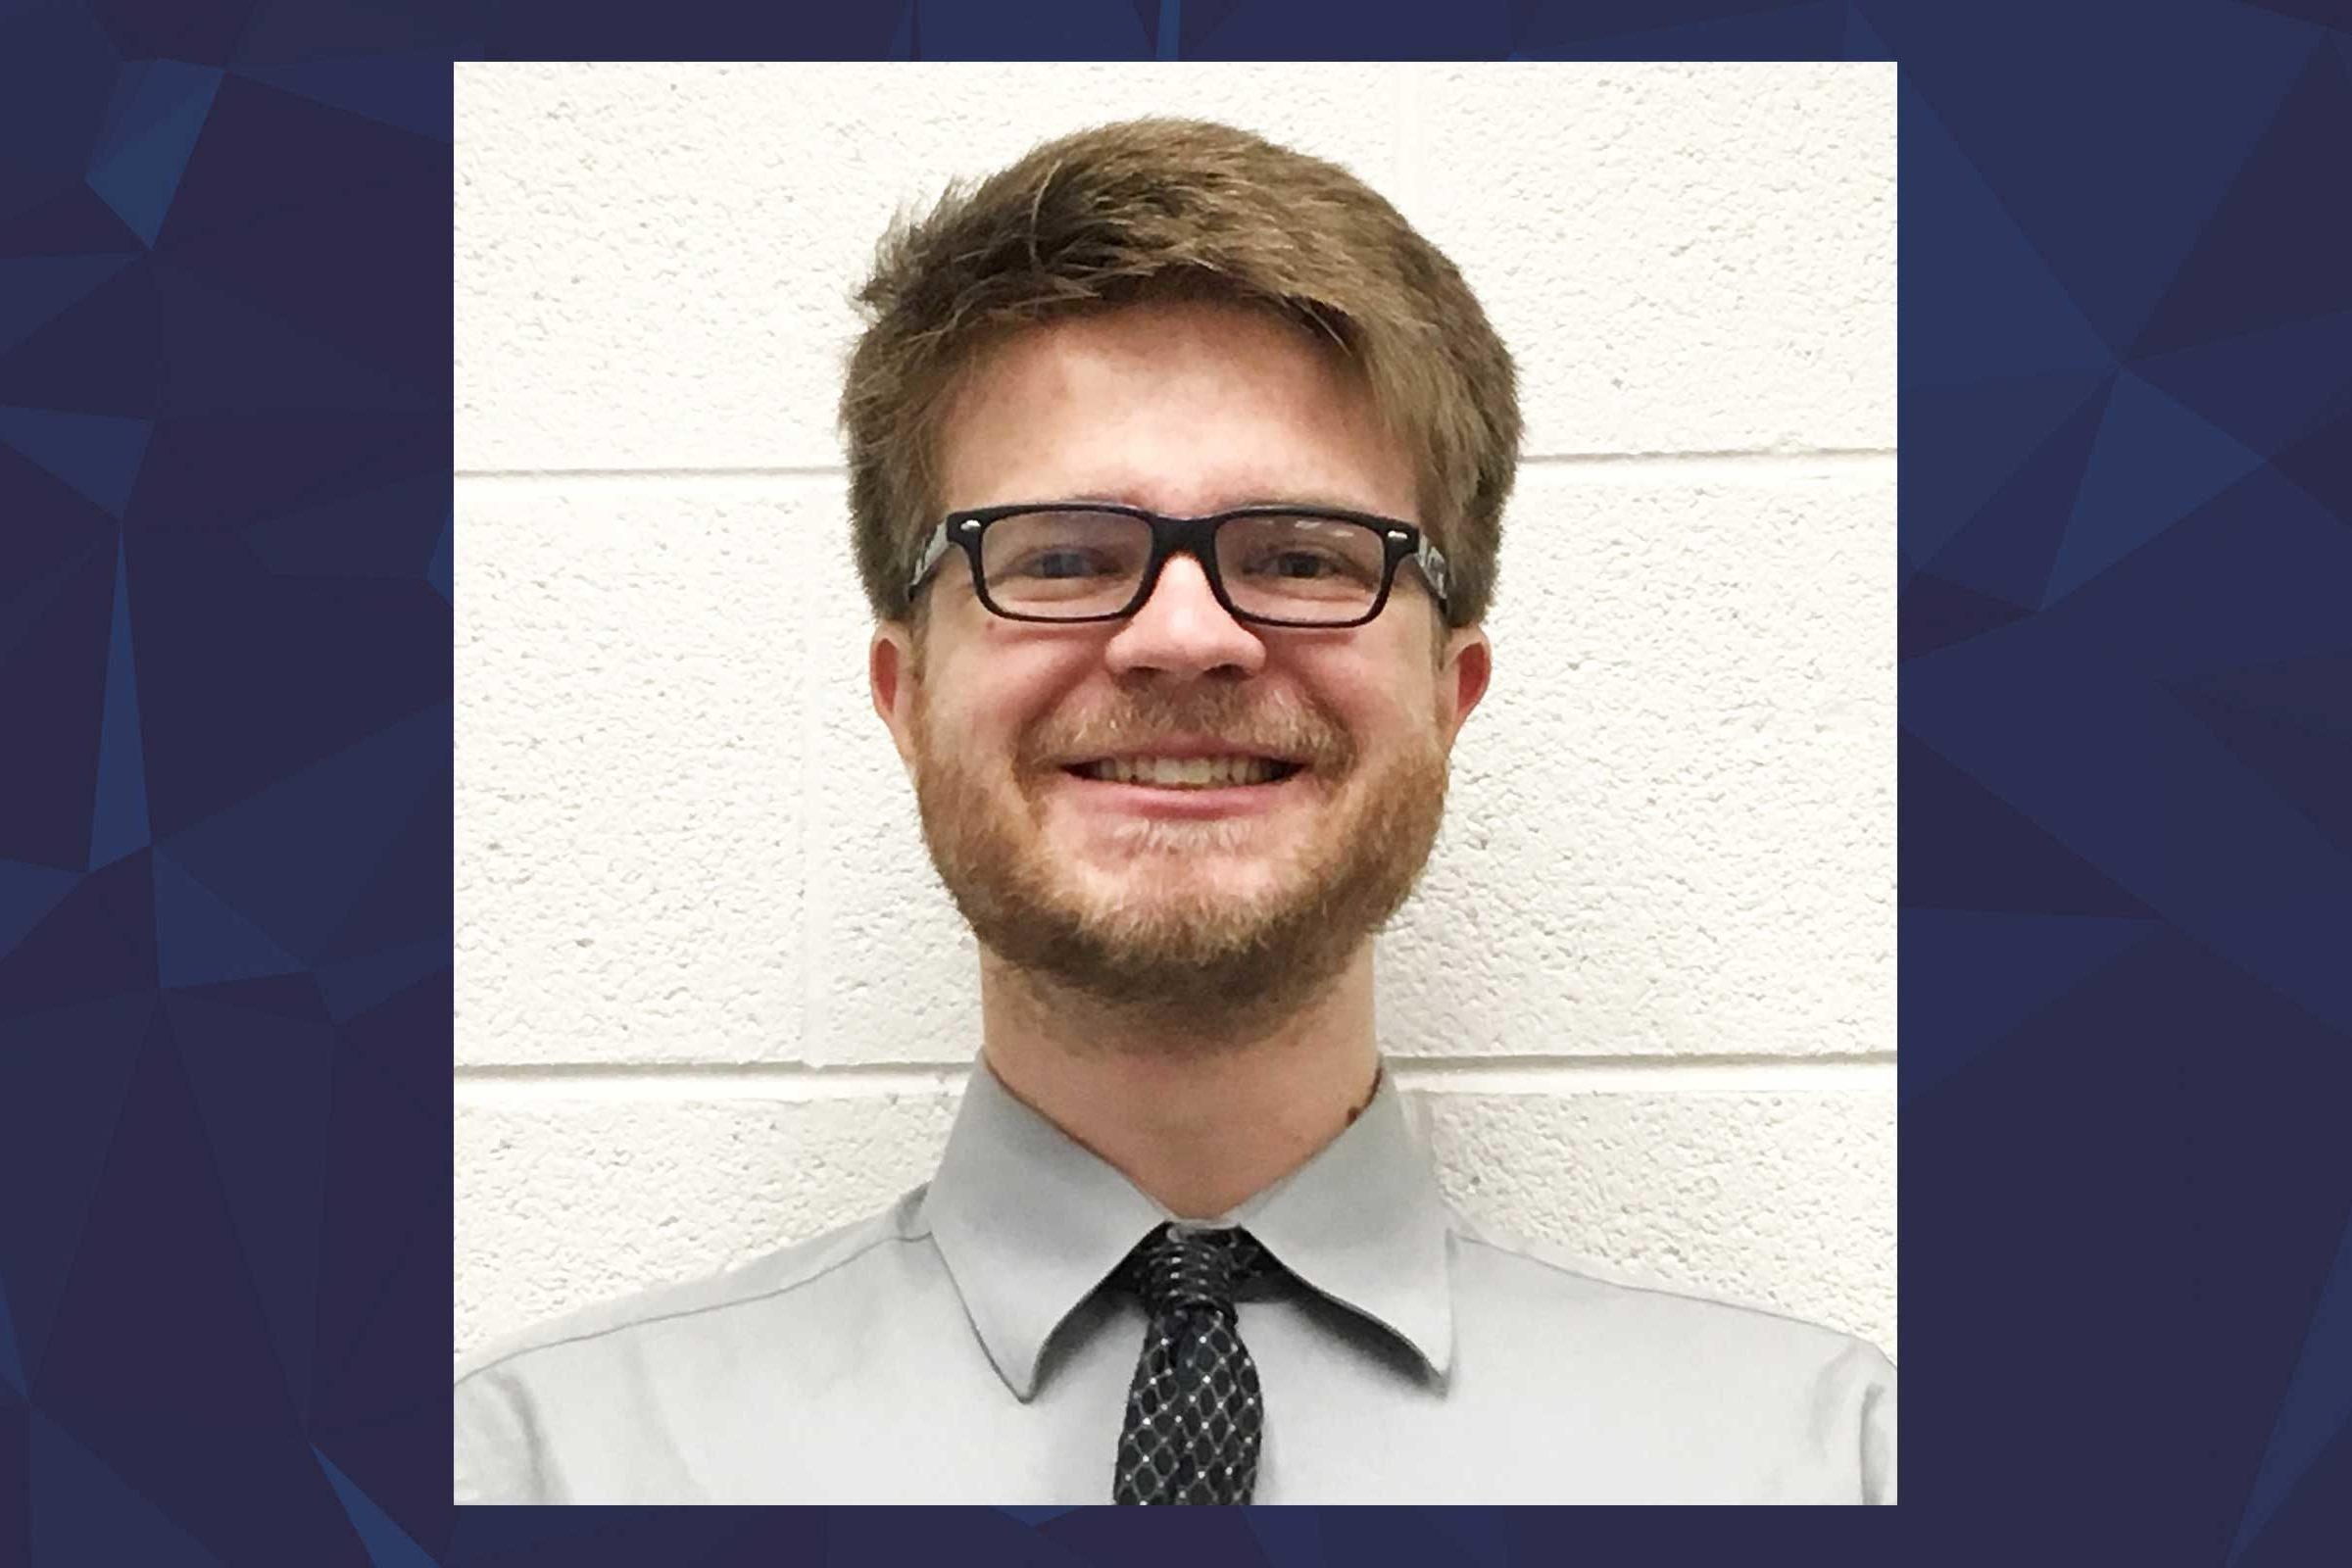 Climate & Space postdoctoral fellow Dr. Alex Hegedus